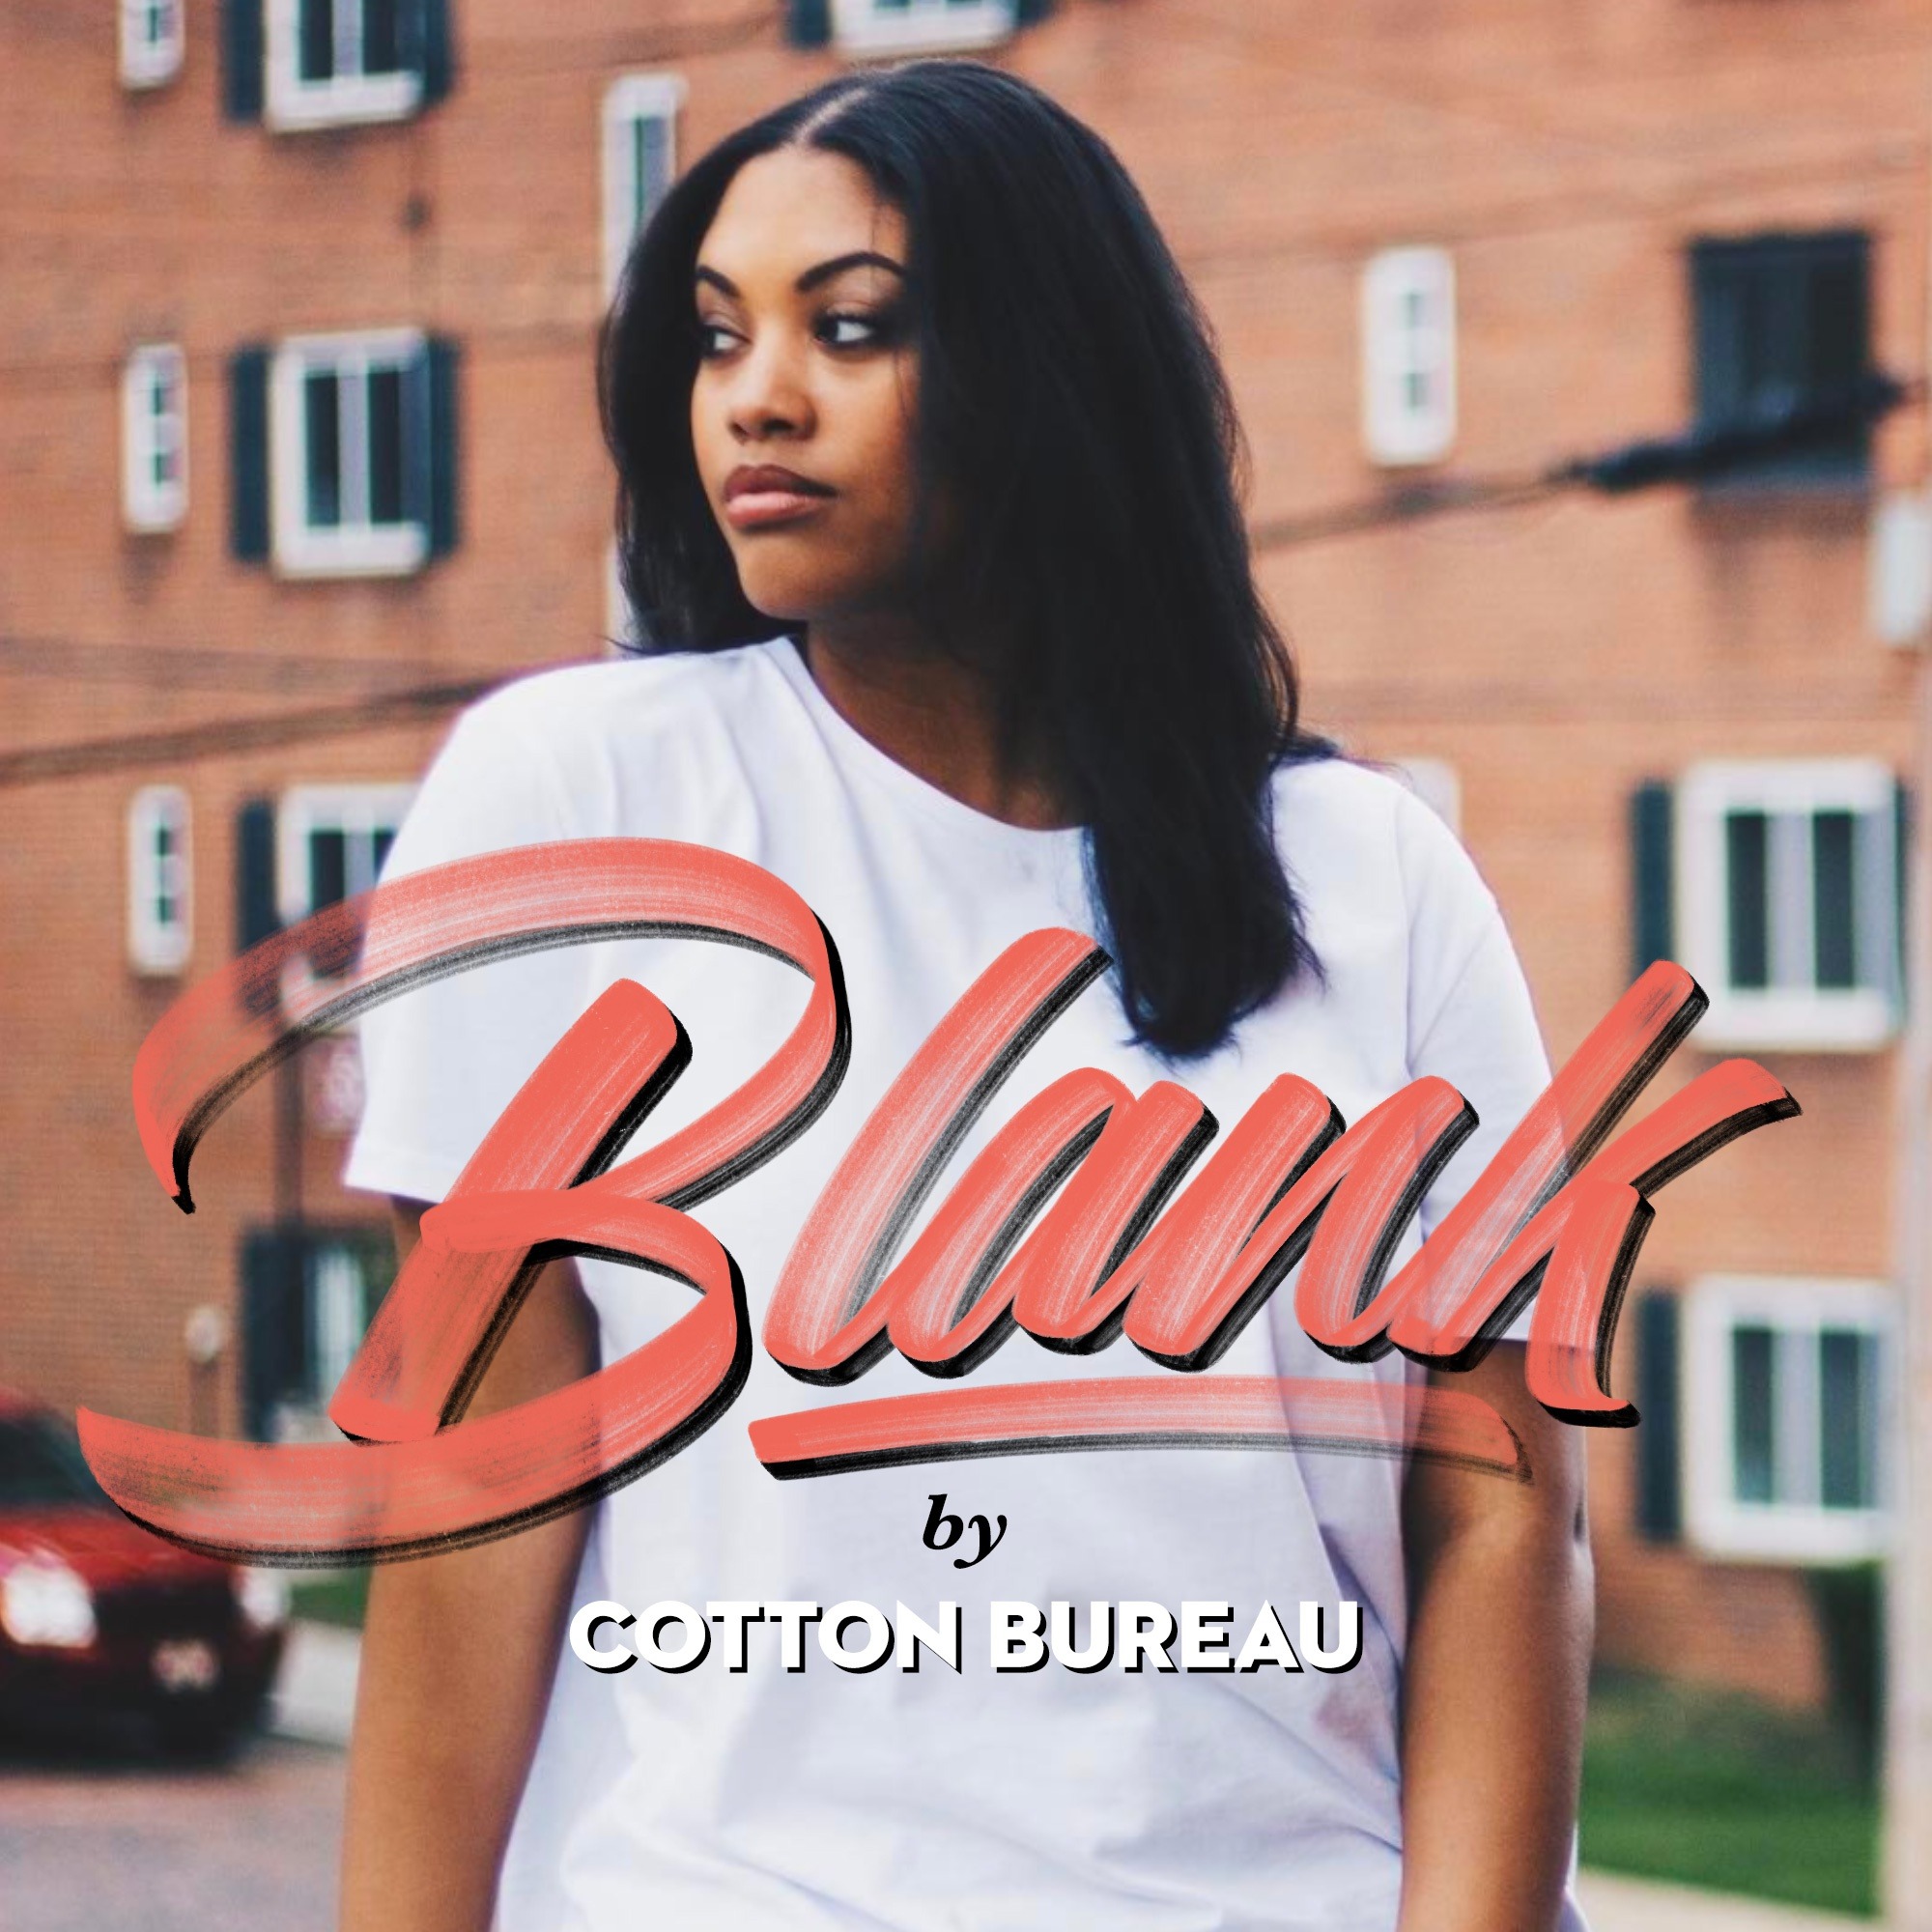 Blank by cb artwork